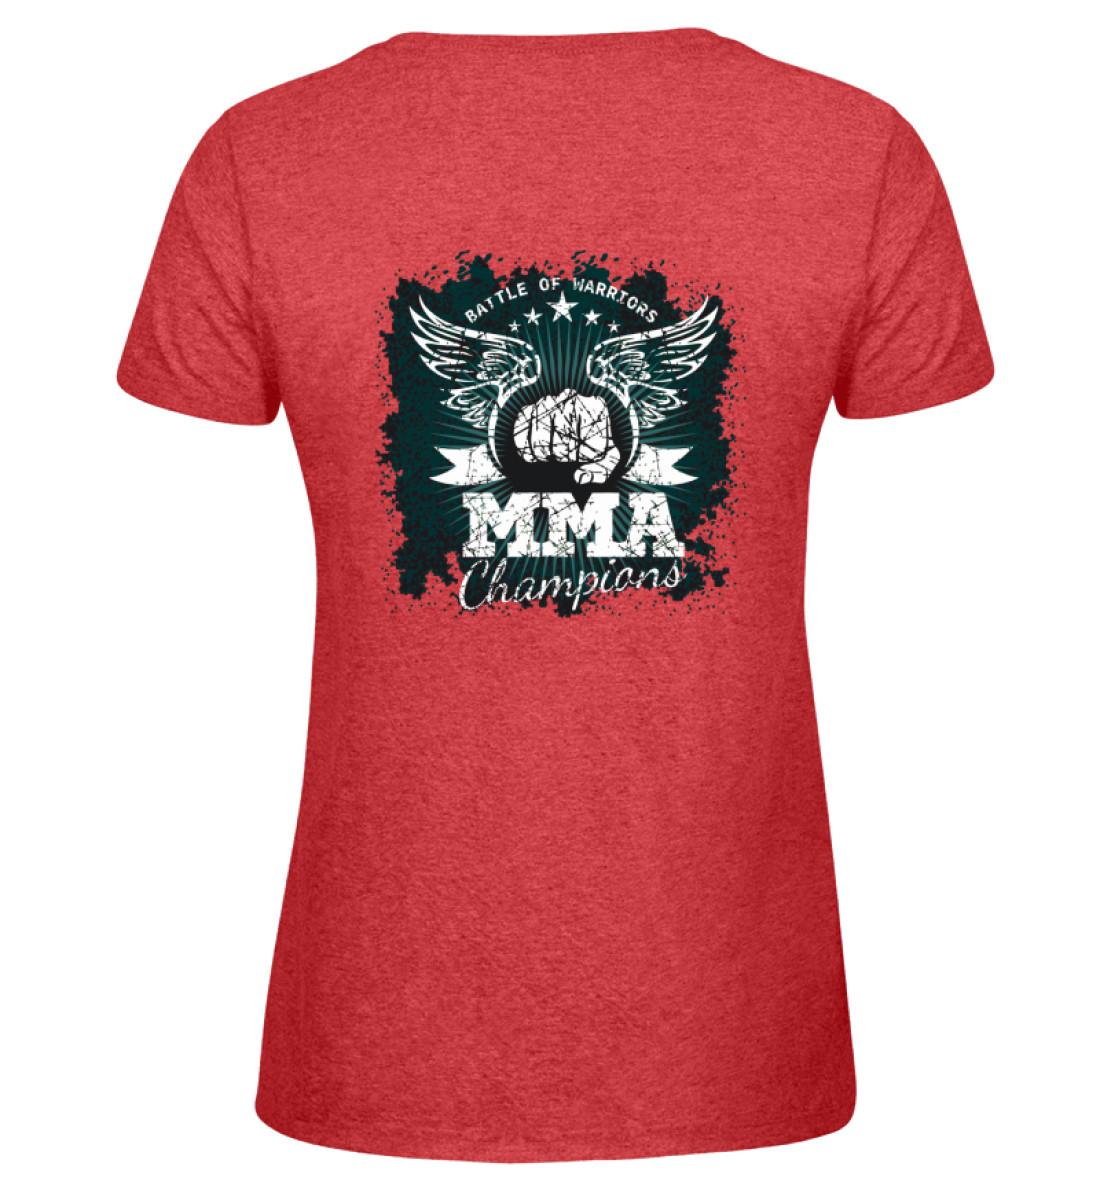 COMA Team - MMA Champions - Damen Melange Shirt-6802